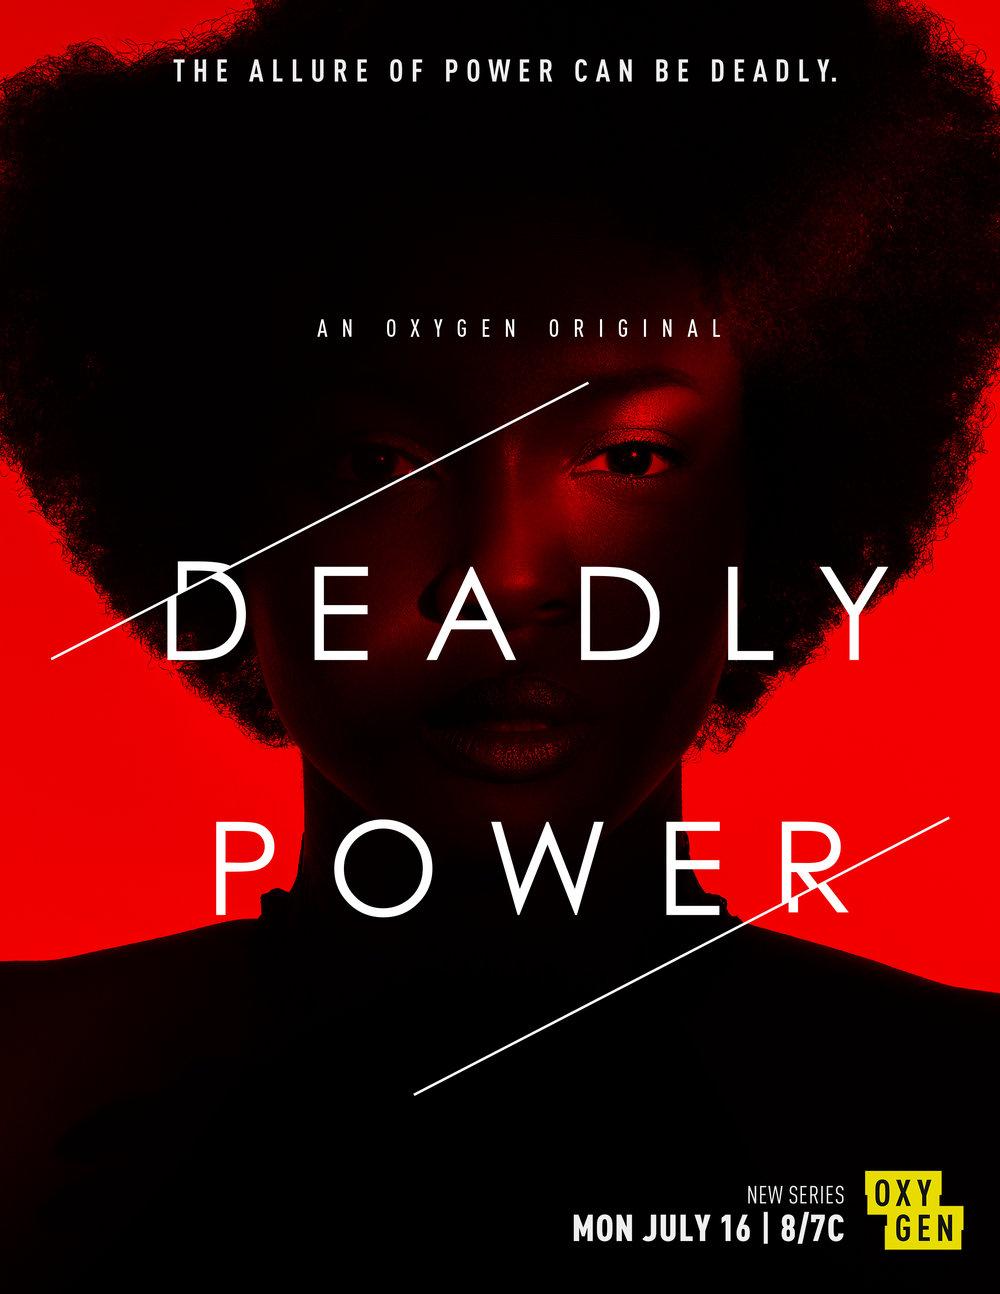 Deadly_Power_KeyArt8.5x11_300dpi_Deana.jpg